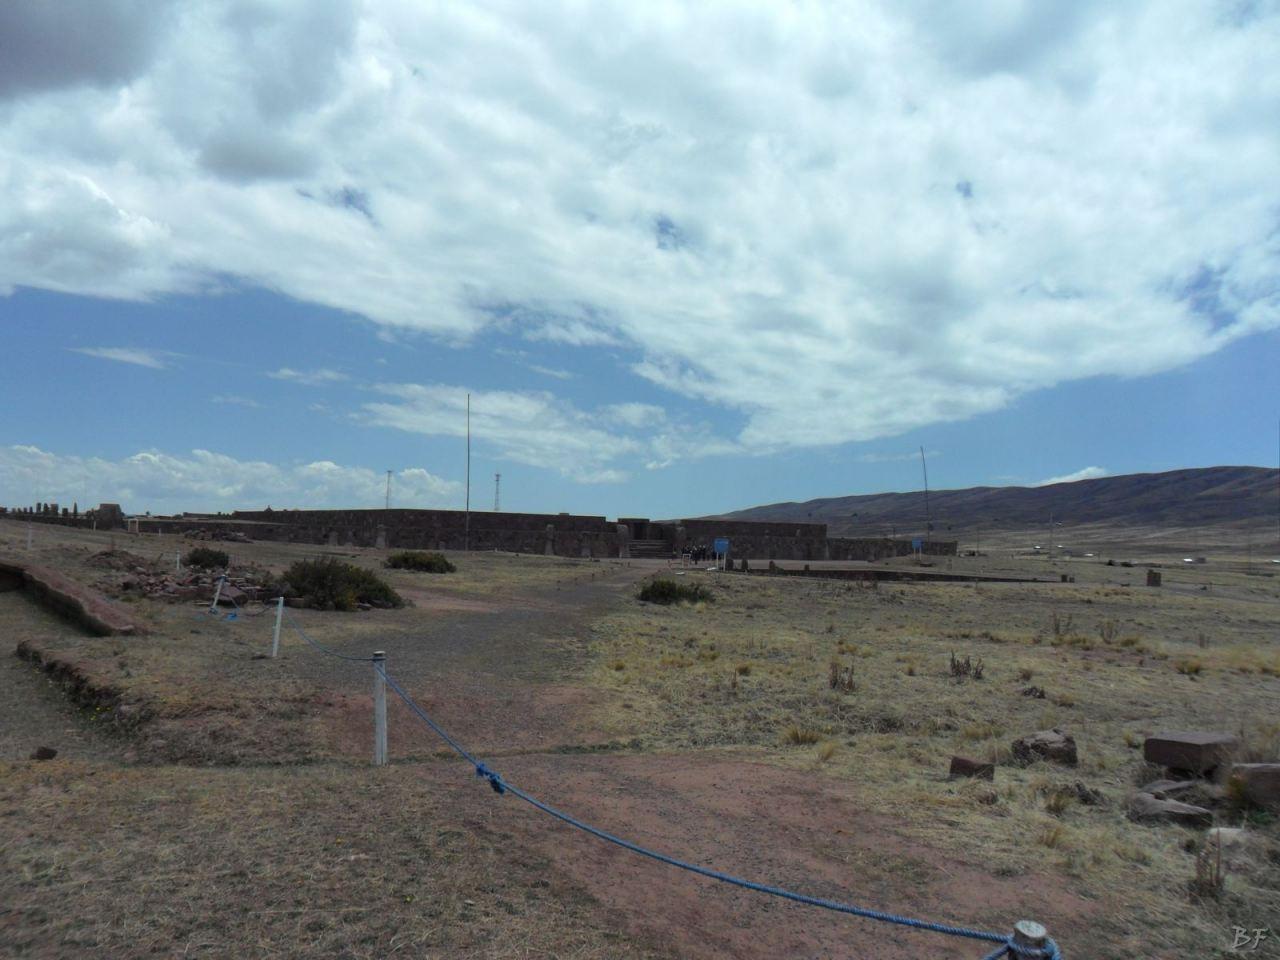 Sito-Megalitico-Piramide-Akapana-Kalasasaya-Menhir-Tiahuanaco-Bolivia-102